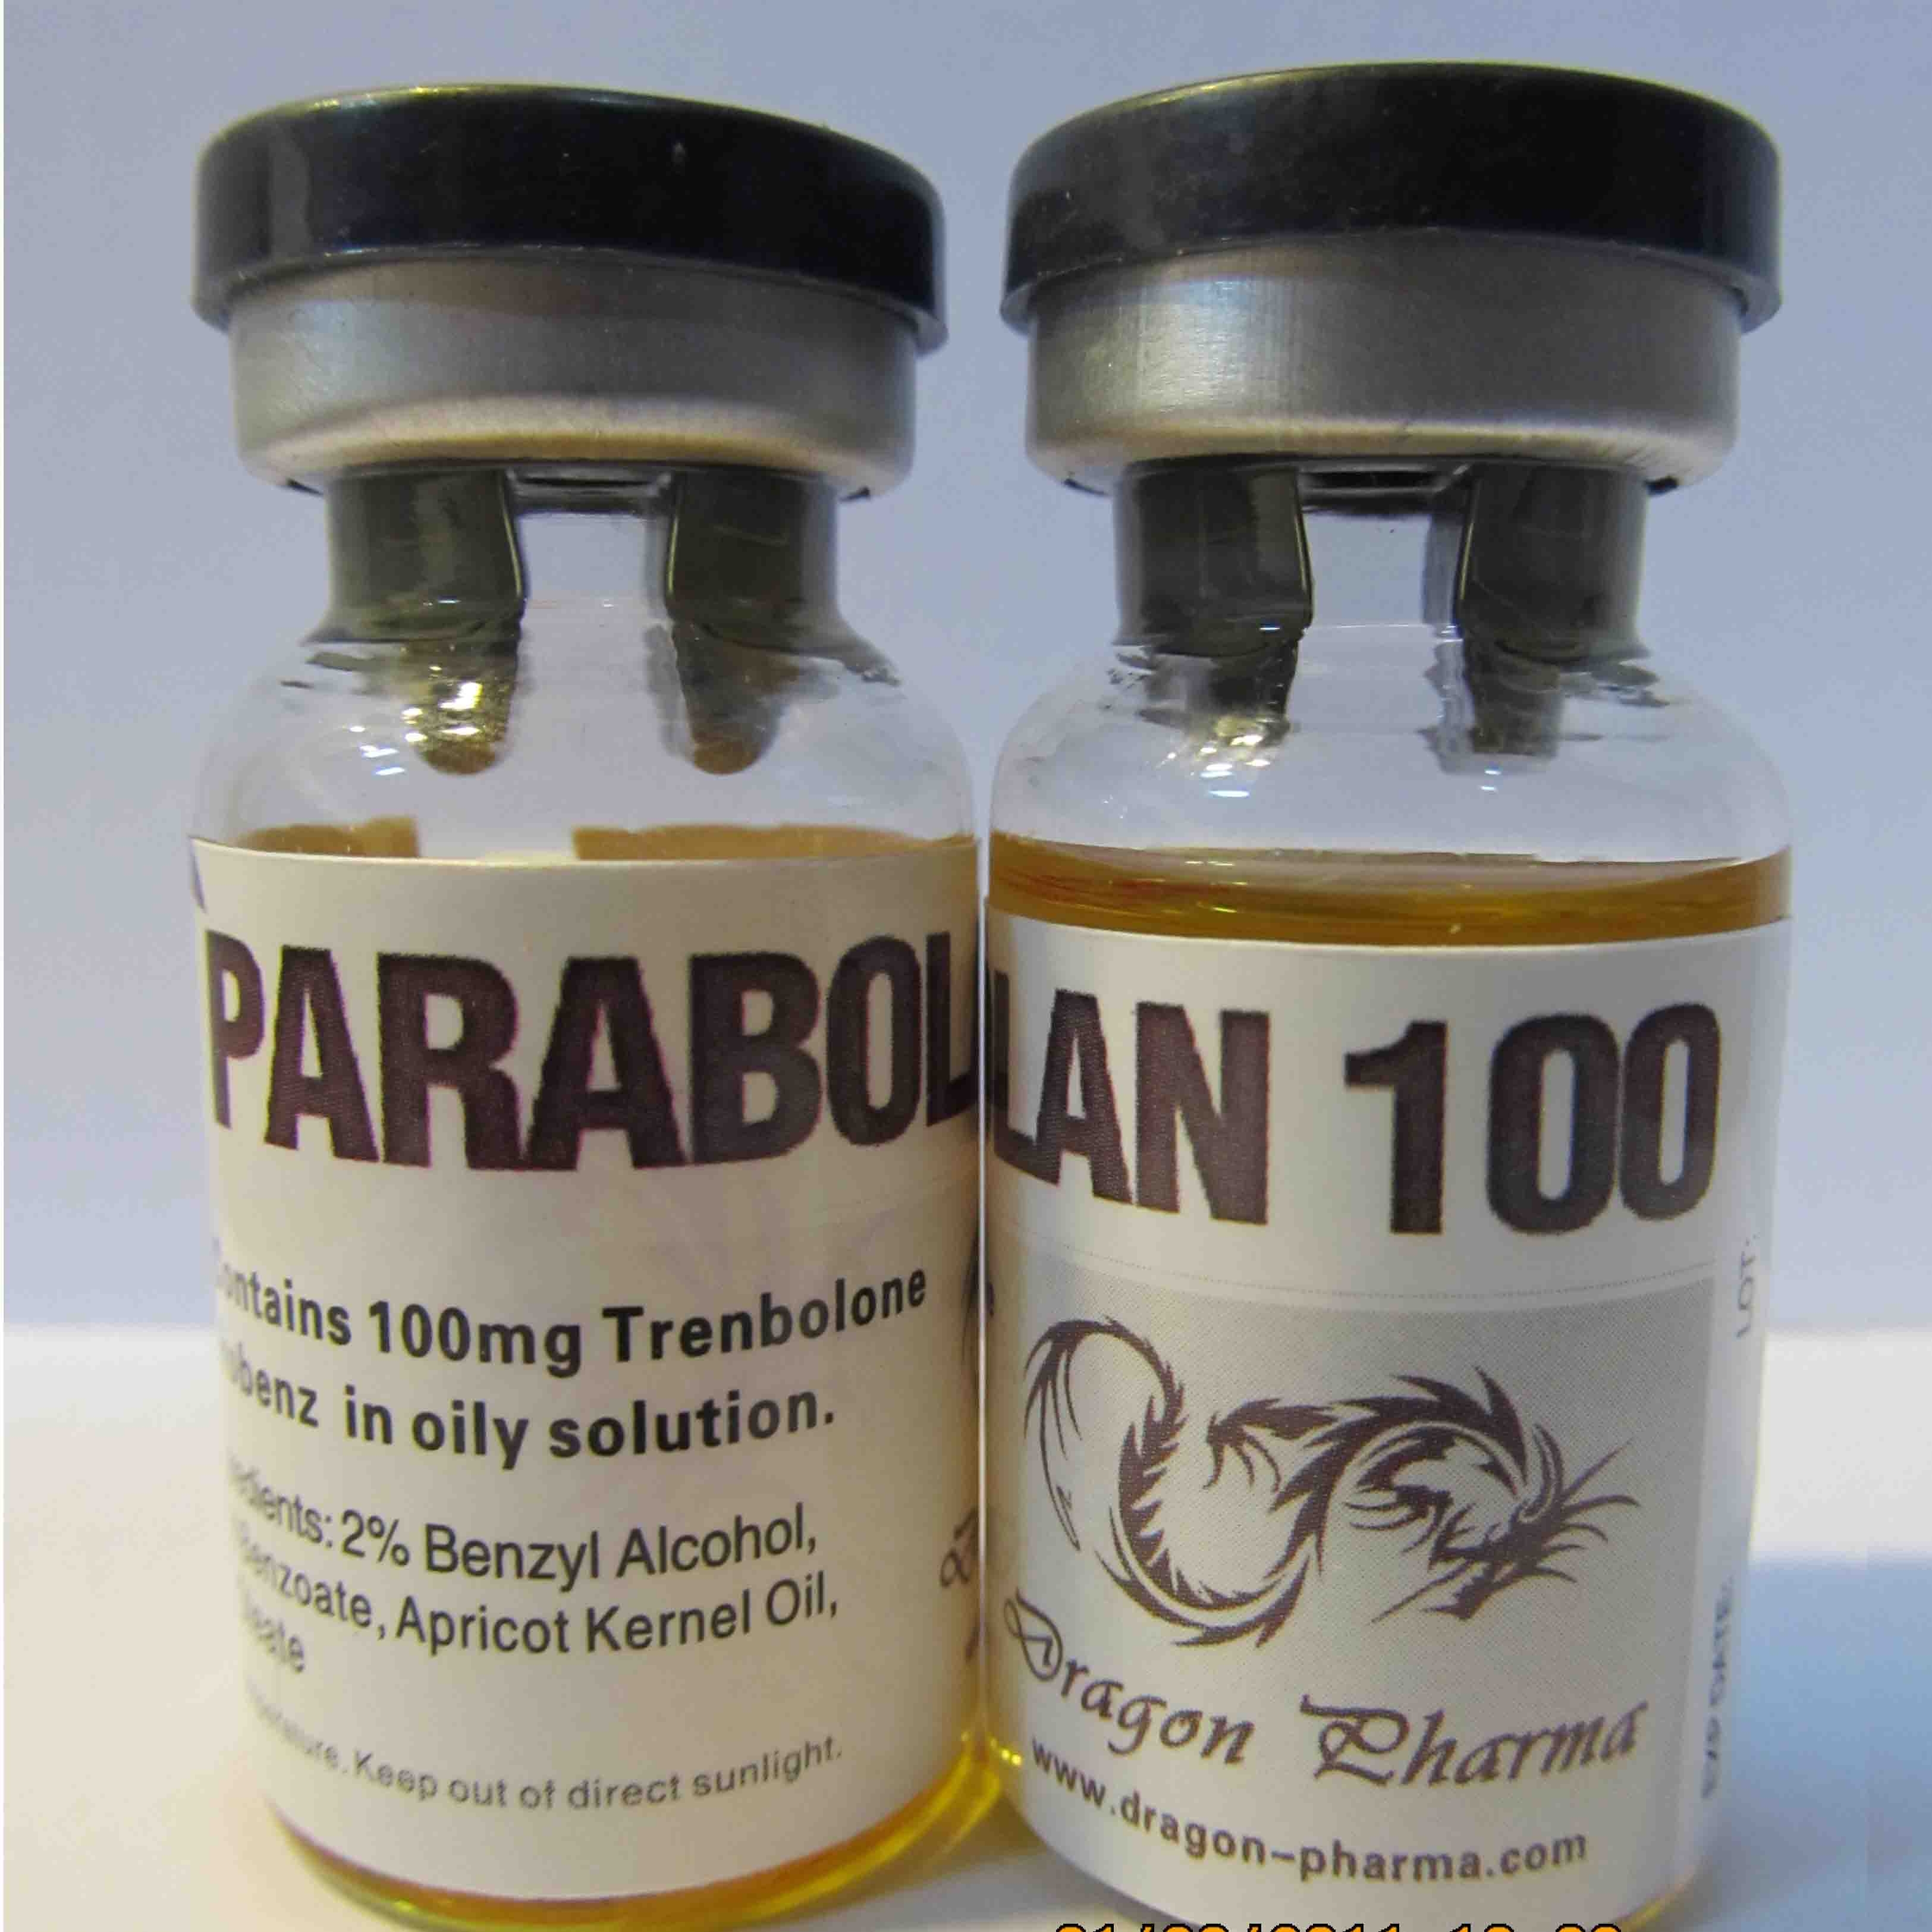 Parabolan 100 Dragon Pharma